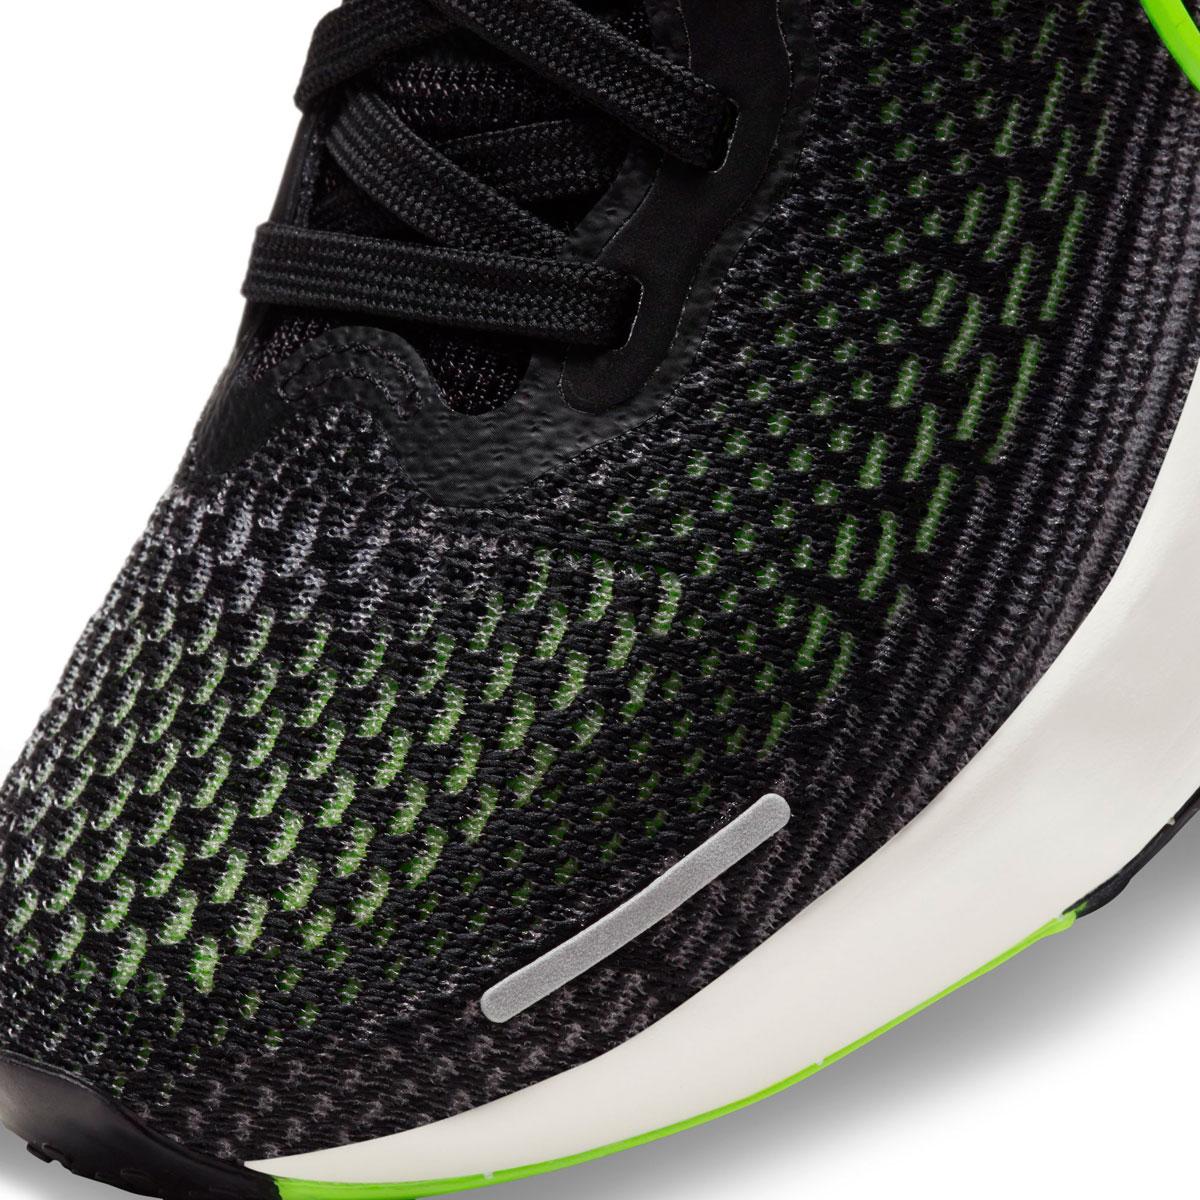 Women's Nike Zoomx Invincible Run FlyKnit Running Shoe - Color: Black/Cyber/Elemental Pink - Size: 6 - Width: Regular, Black/Cyber/Elemental Pink, large, image 7